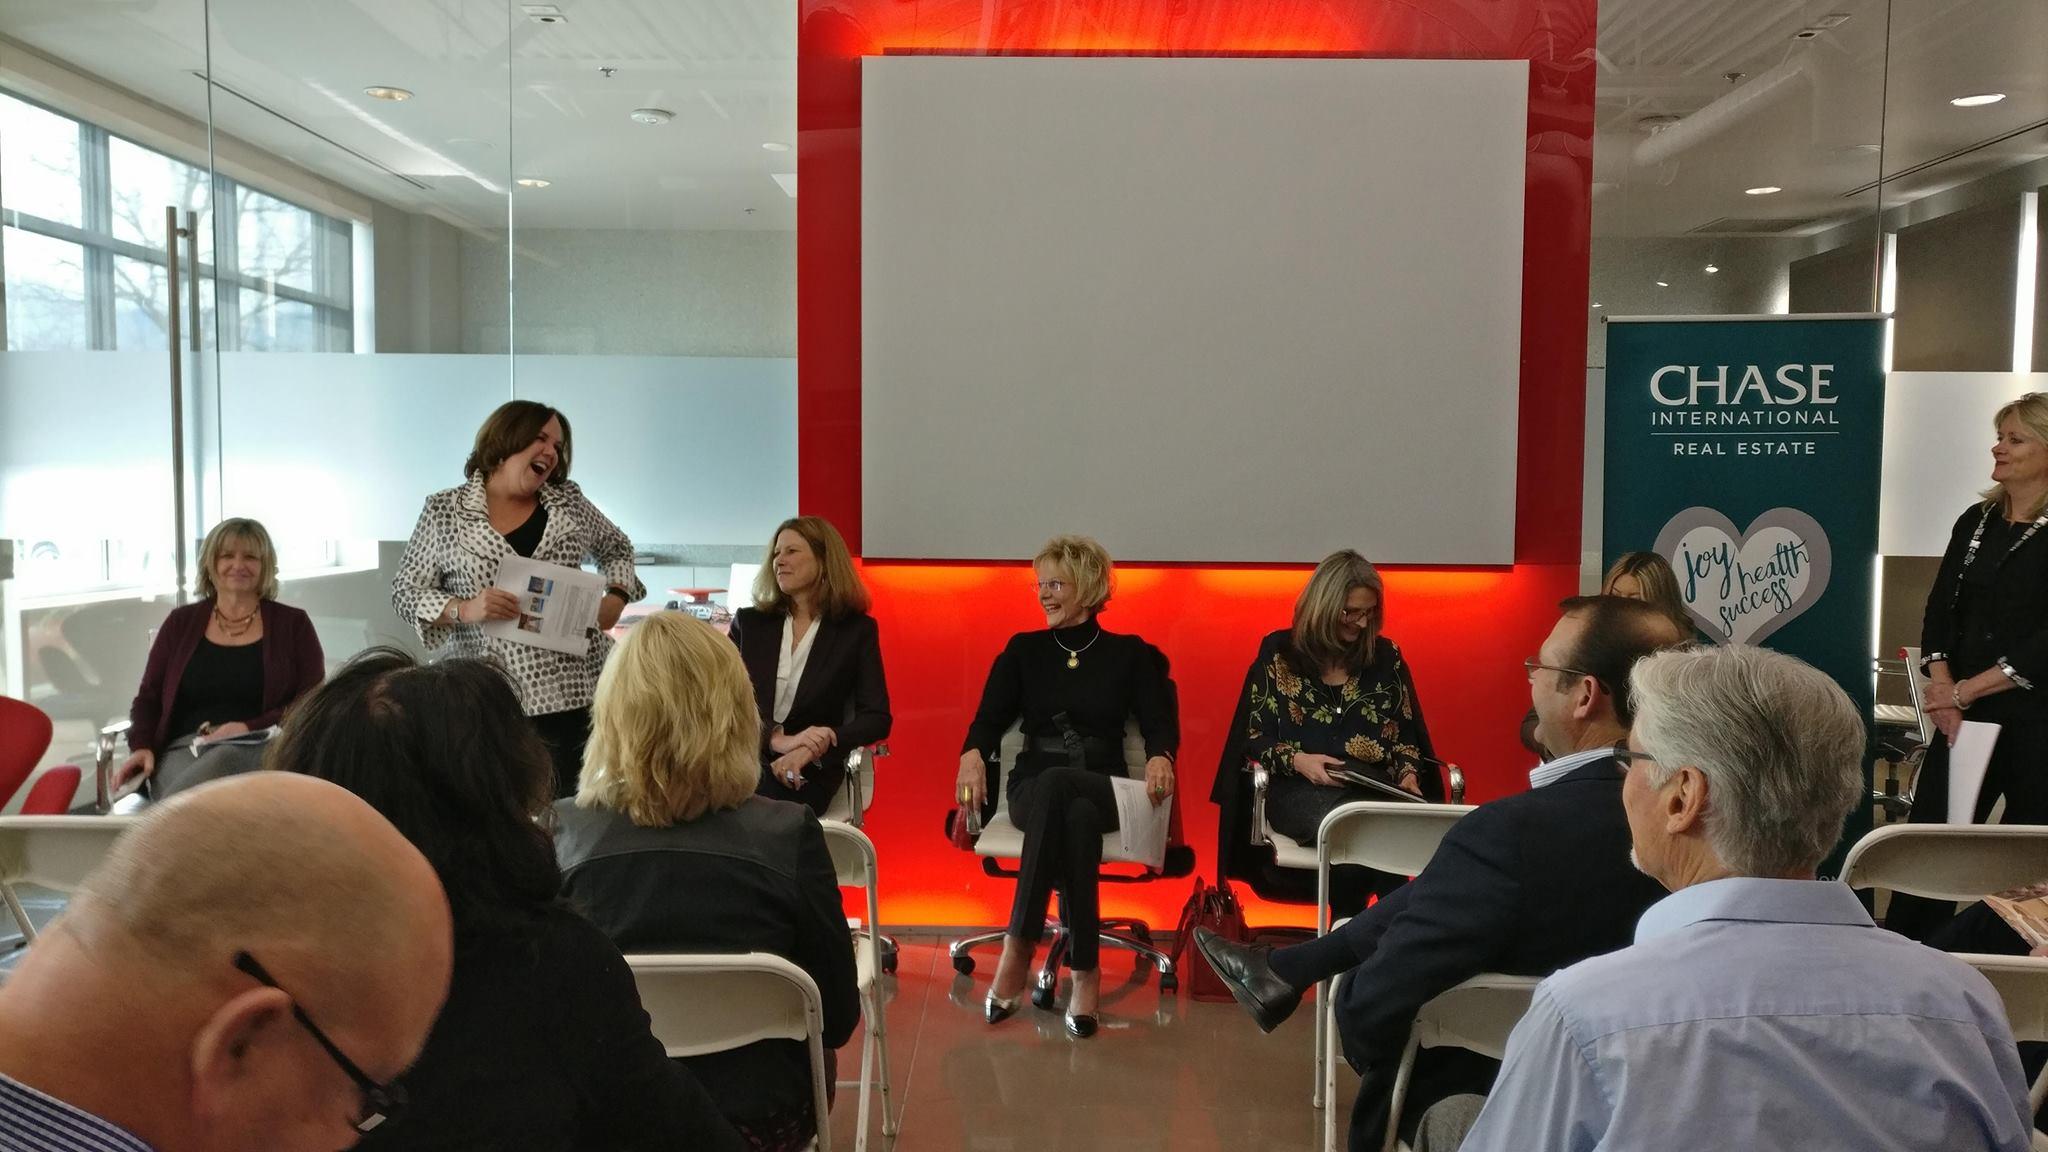 Chase International Luxury Real Estate Agent Panel Presentation